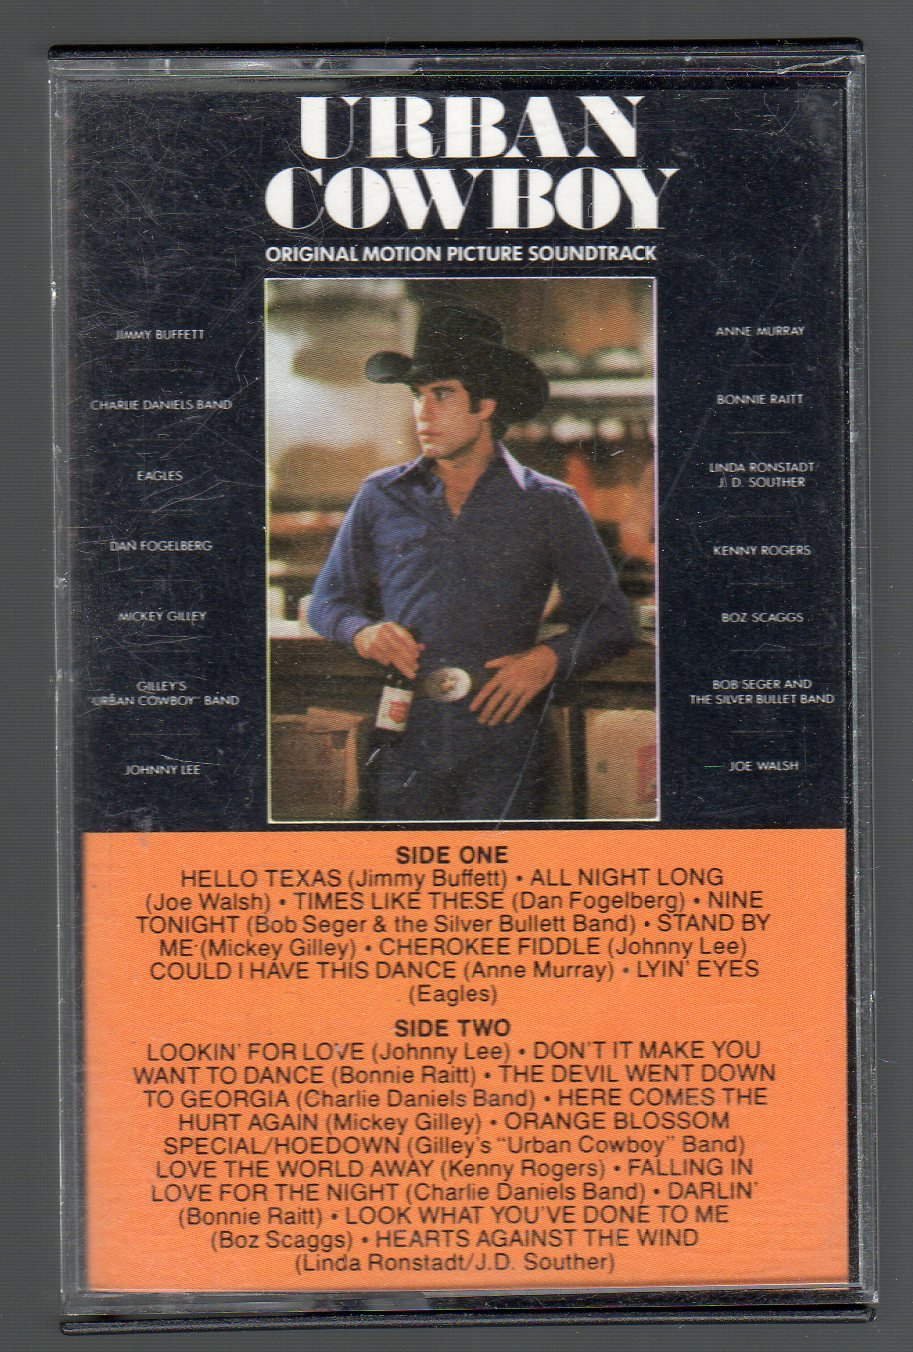 Urban Cowboy - Motion Picture Soundtrack SOLD Cassette Tape